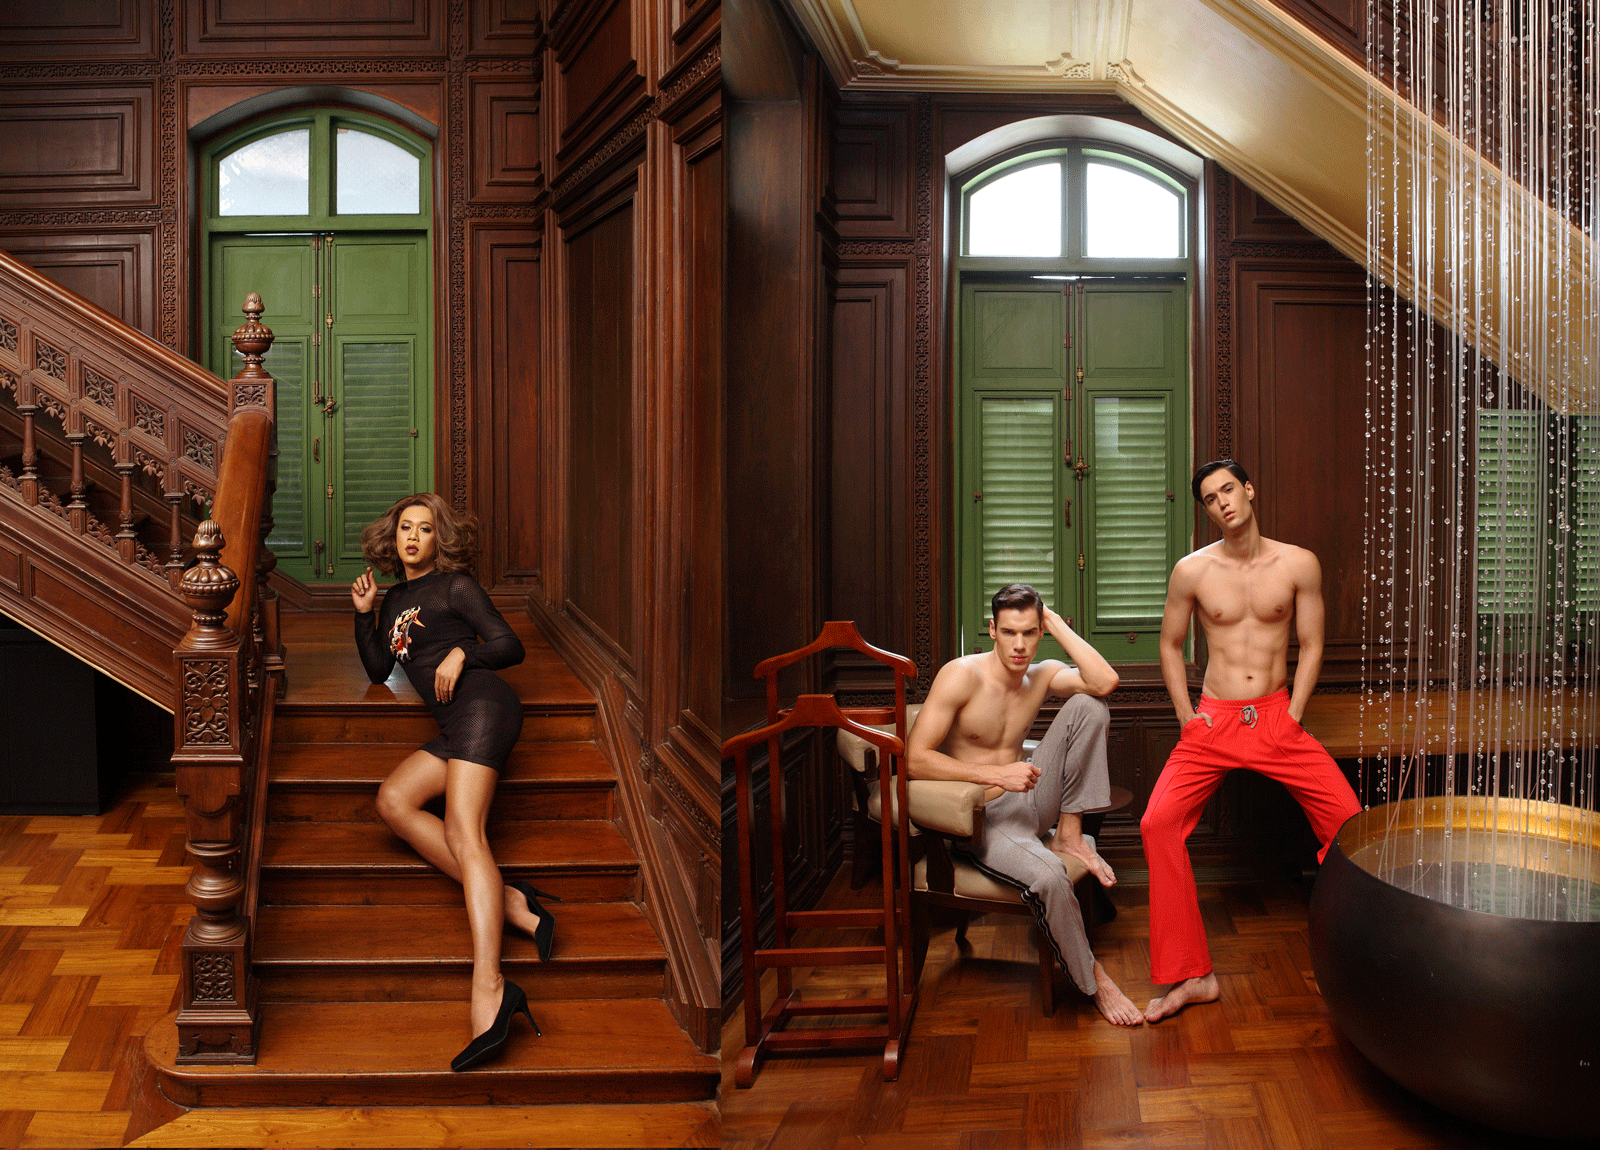 Jennie Panhan @jennie_panhan /Nikita, Ivan @cliomodel